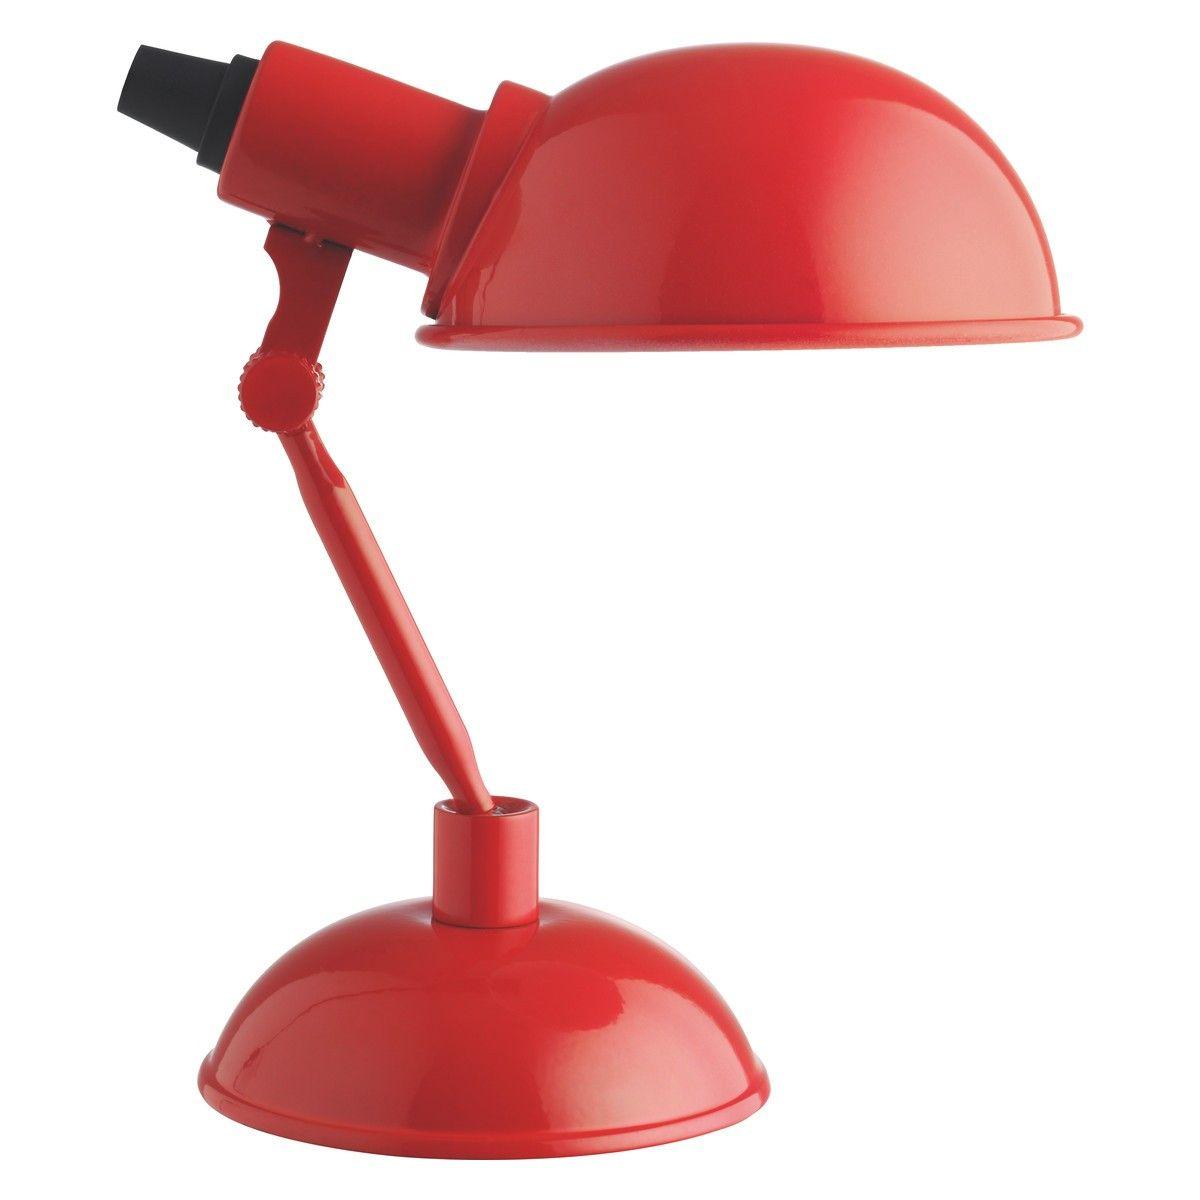 Tommy Red Metal Desk Lamp Now At Habitat Uk